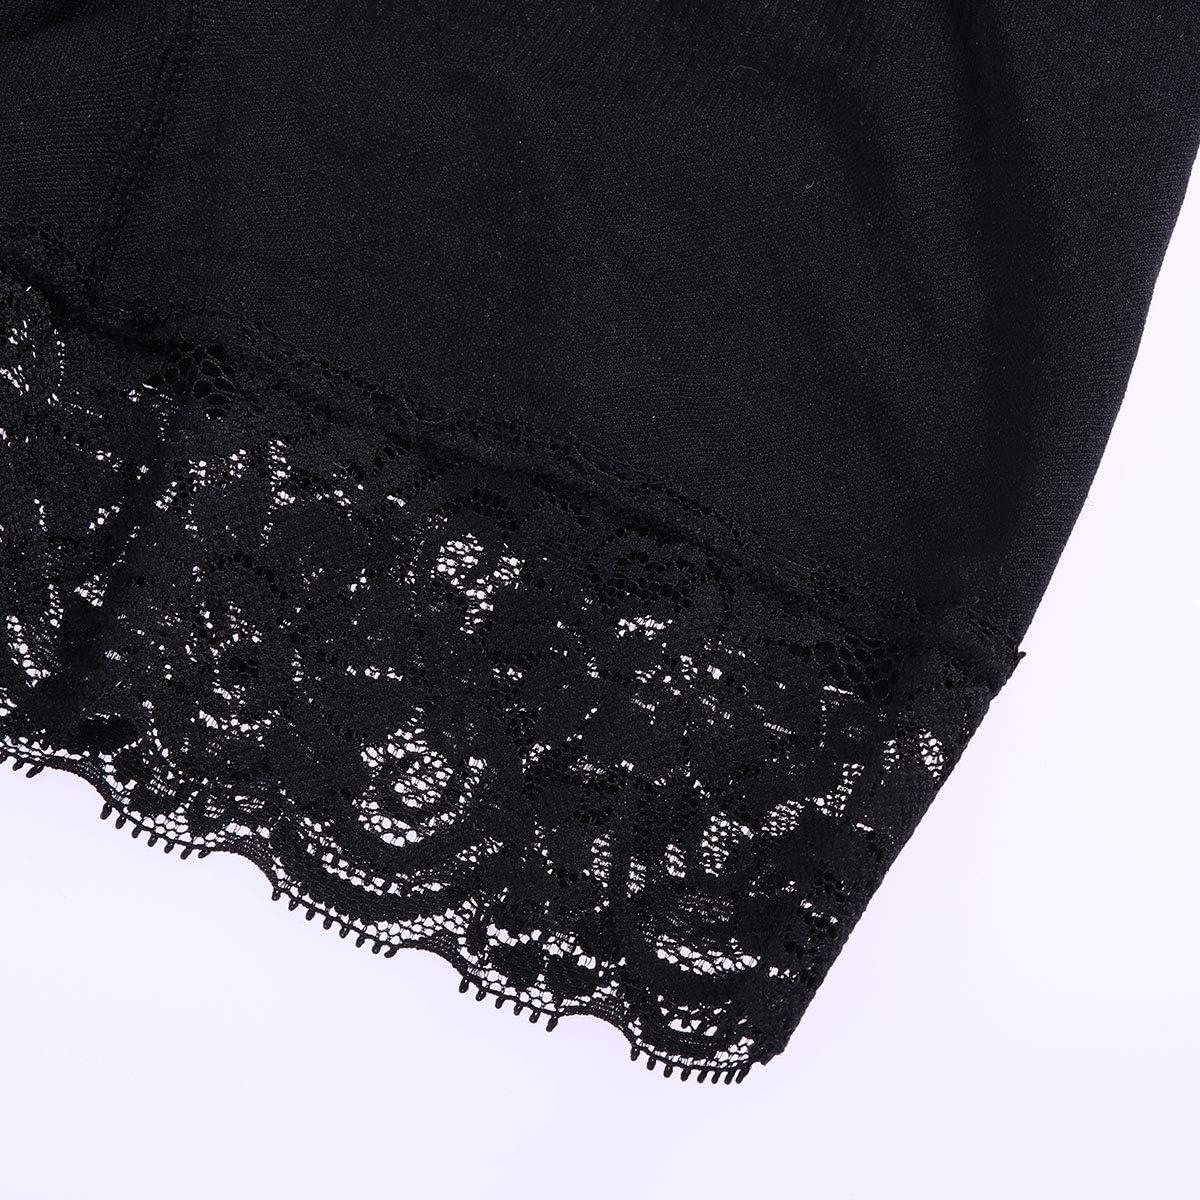 Black FENICAL Womens Butt Lifter Shaper Steel Bone Tummy Control Corset High Waist Underwear Briefs Size XL